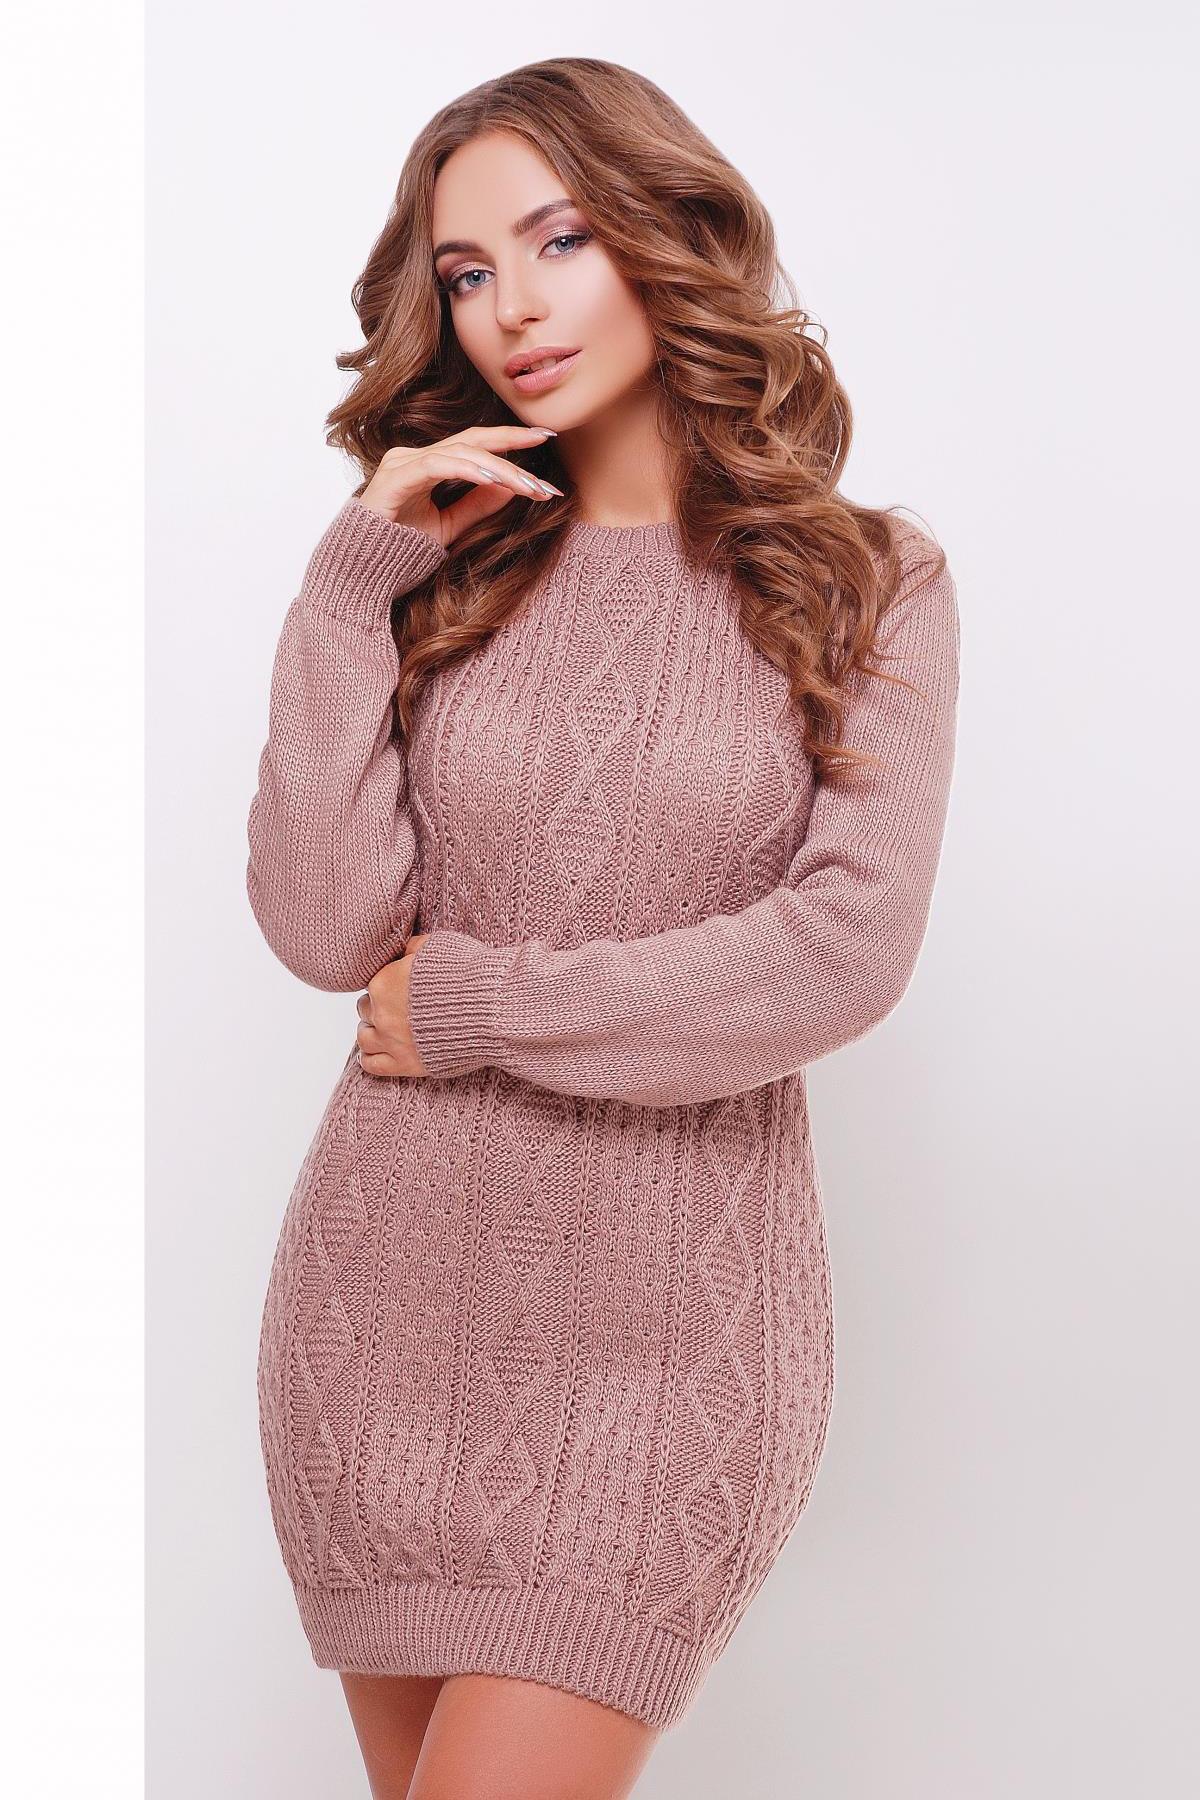 3483459d2d1a теплое вязаное платье туника. Платье-туника 143. Цвет  фрез